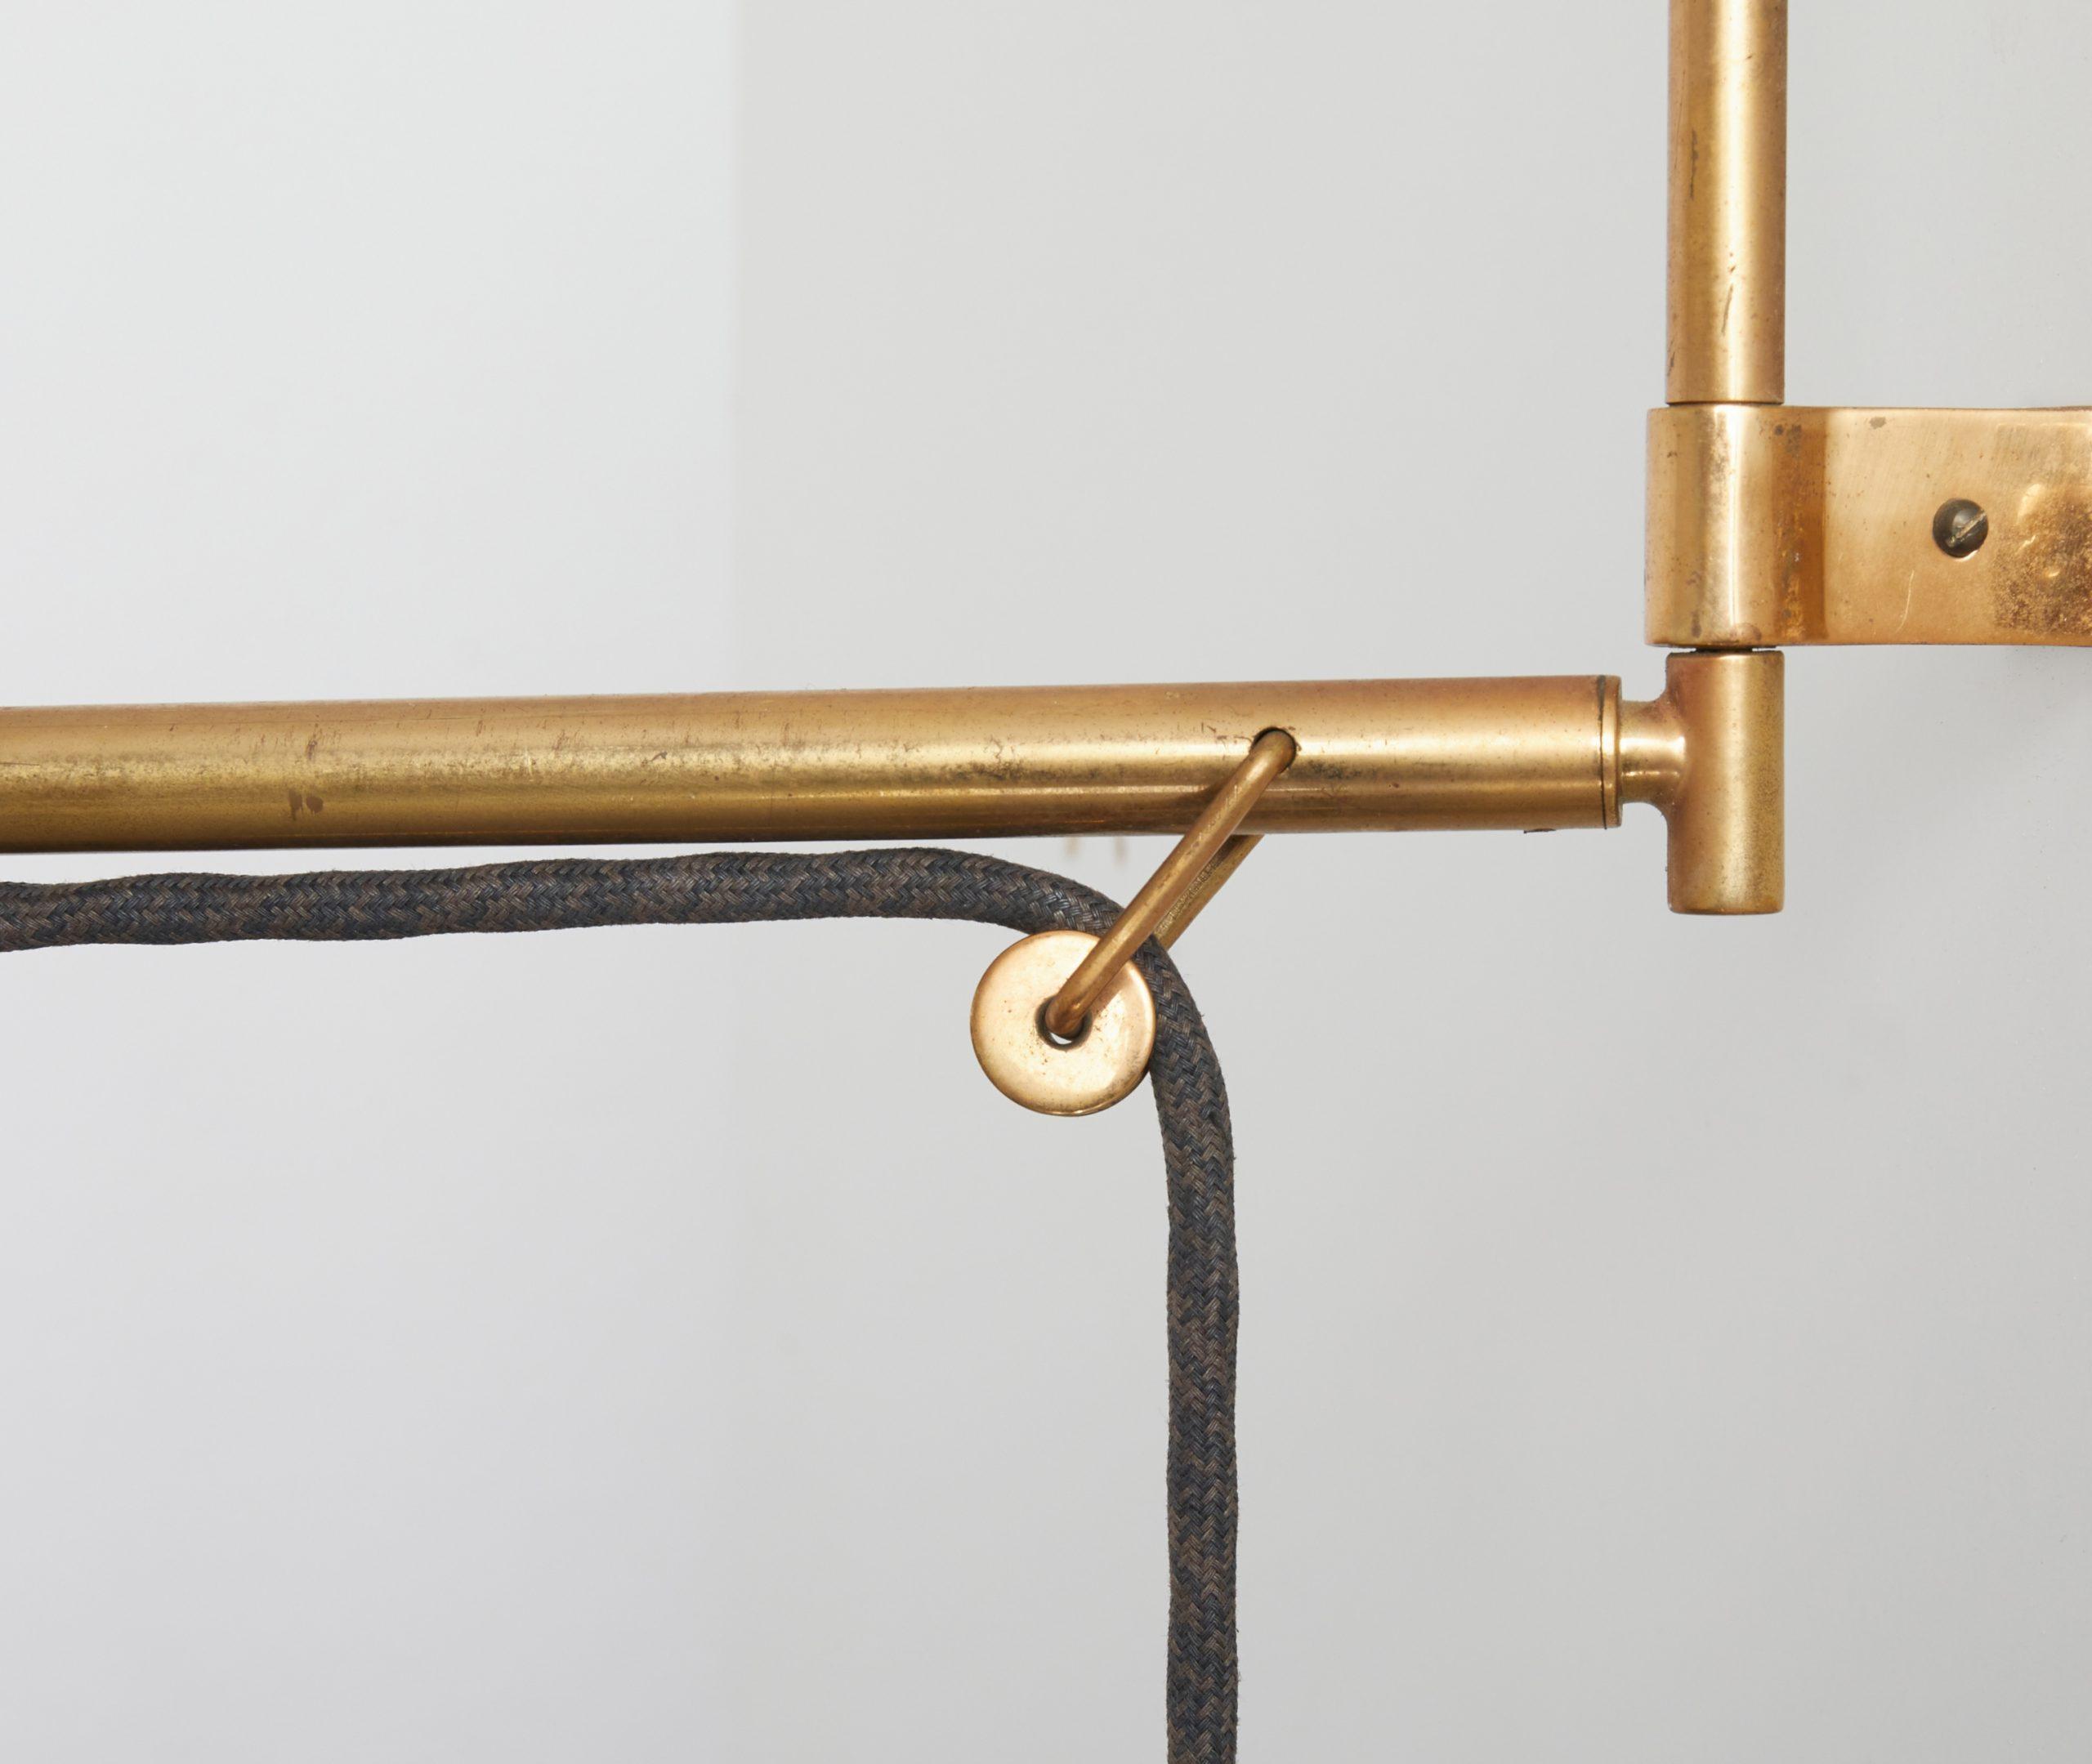 brass-wall-lamp-model-2061-by-gaetano-scolari-for-stilnovo-1954-image-12